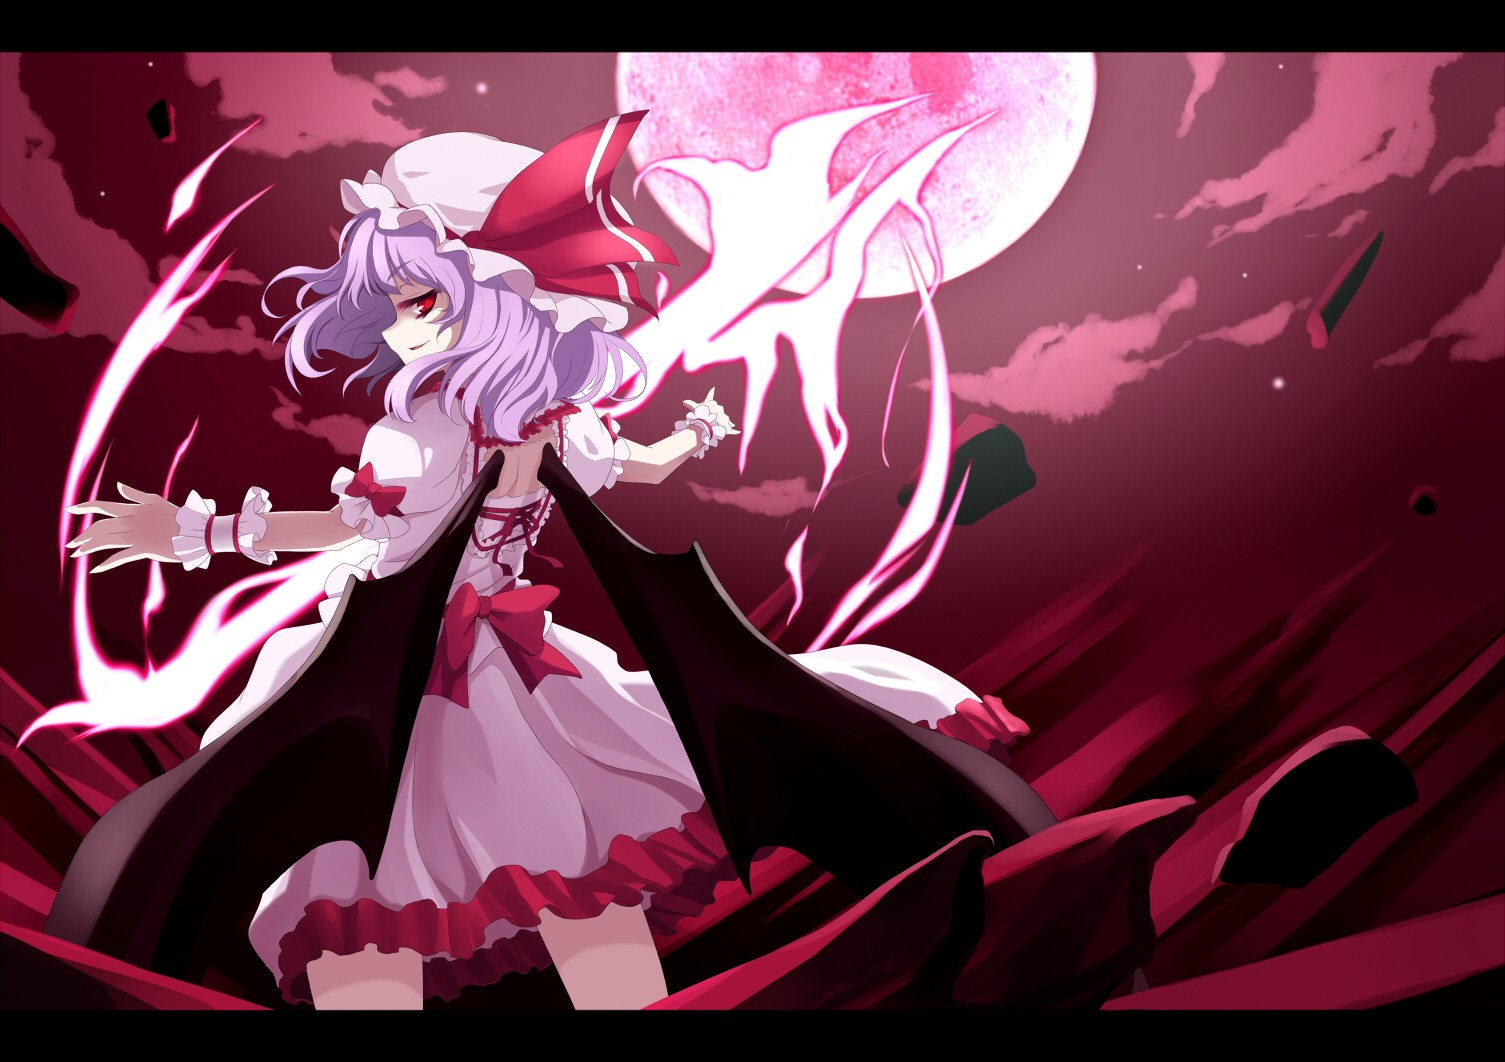 Touhou wings dress night Moon purple hair short hair hats Remilia Scarlet anime girls vampire wallpaper | 1505x1062 | 206234 | WallpaperUP